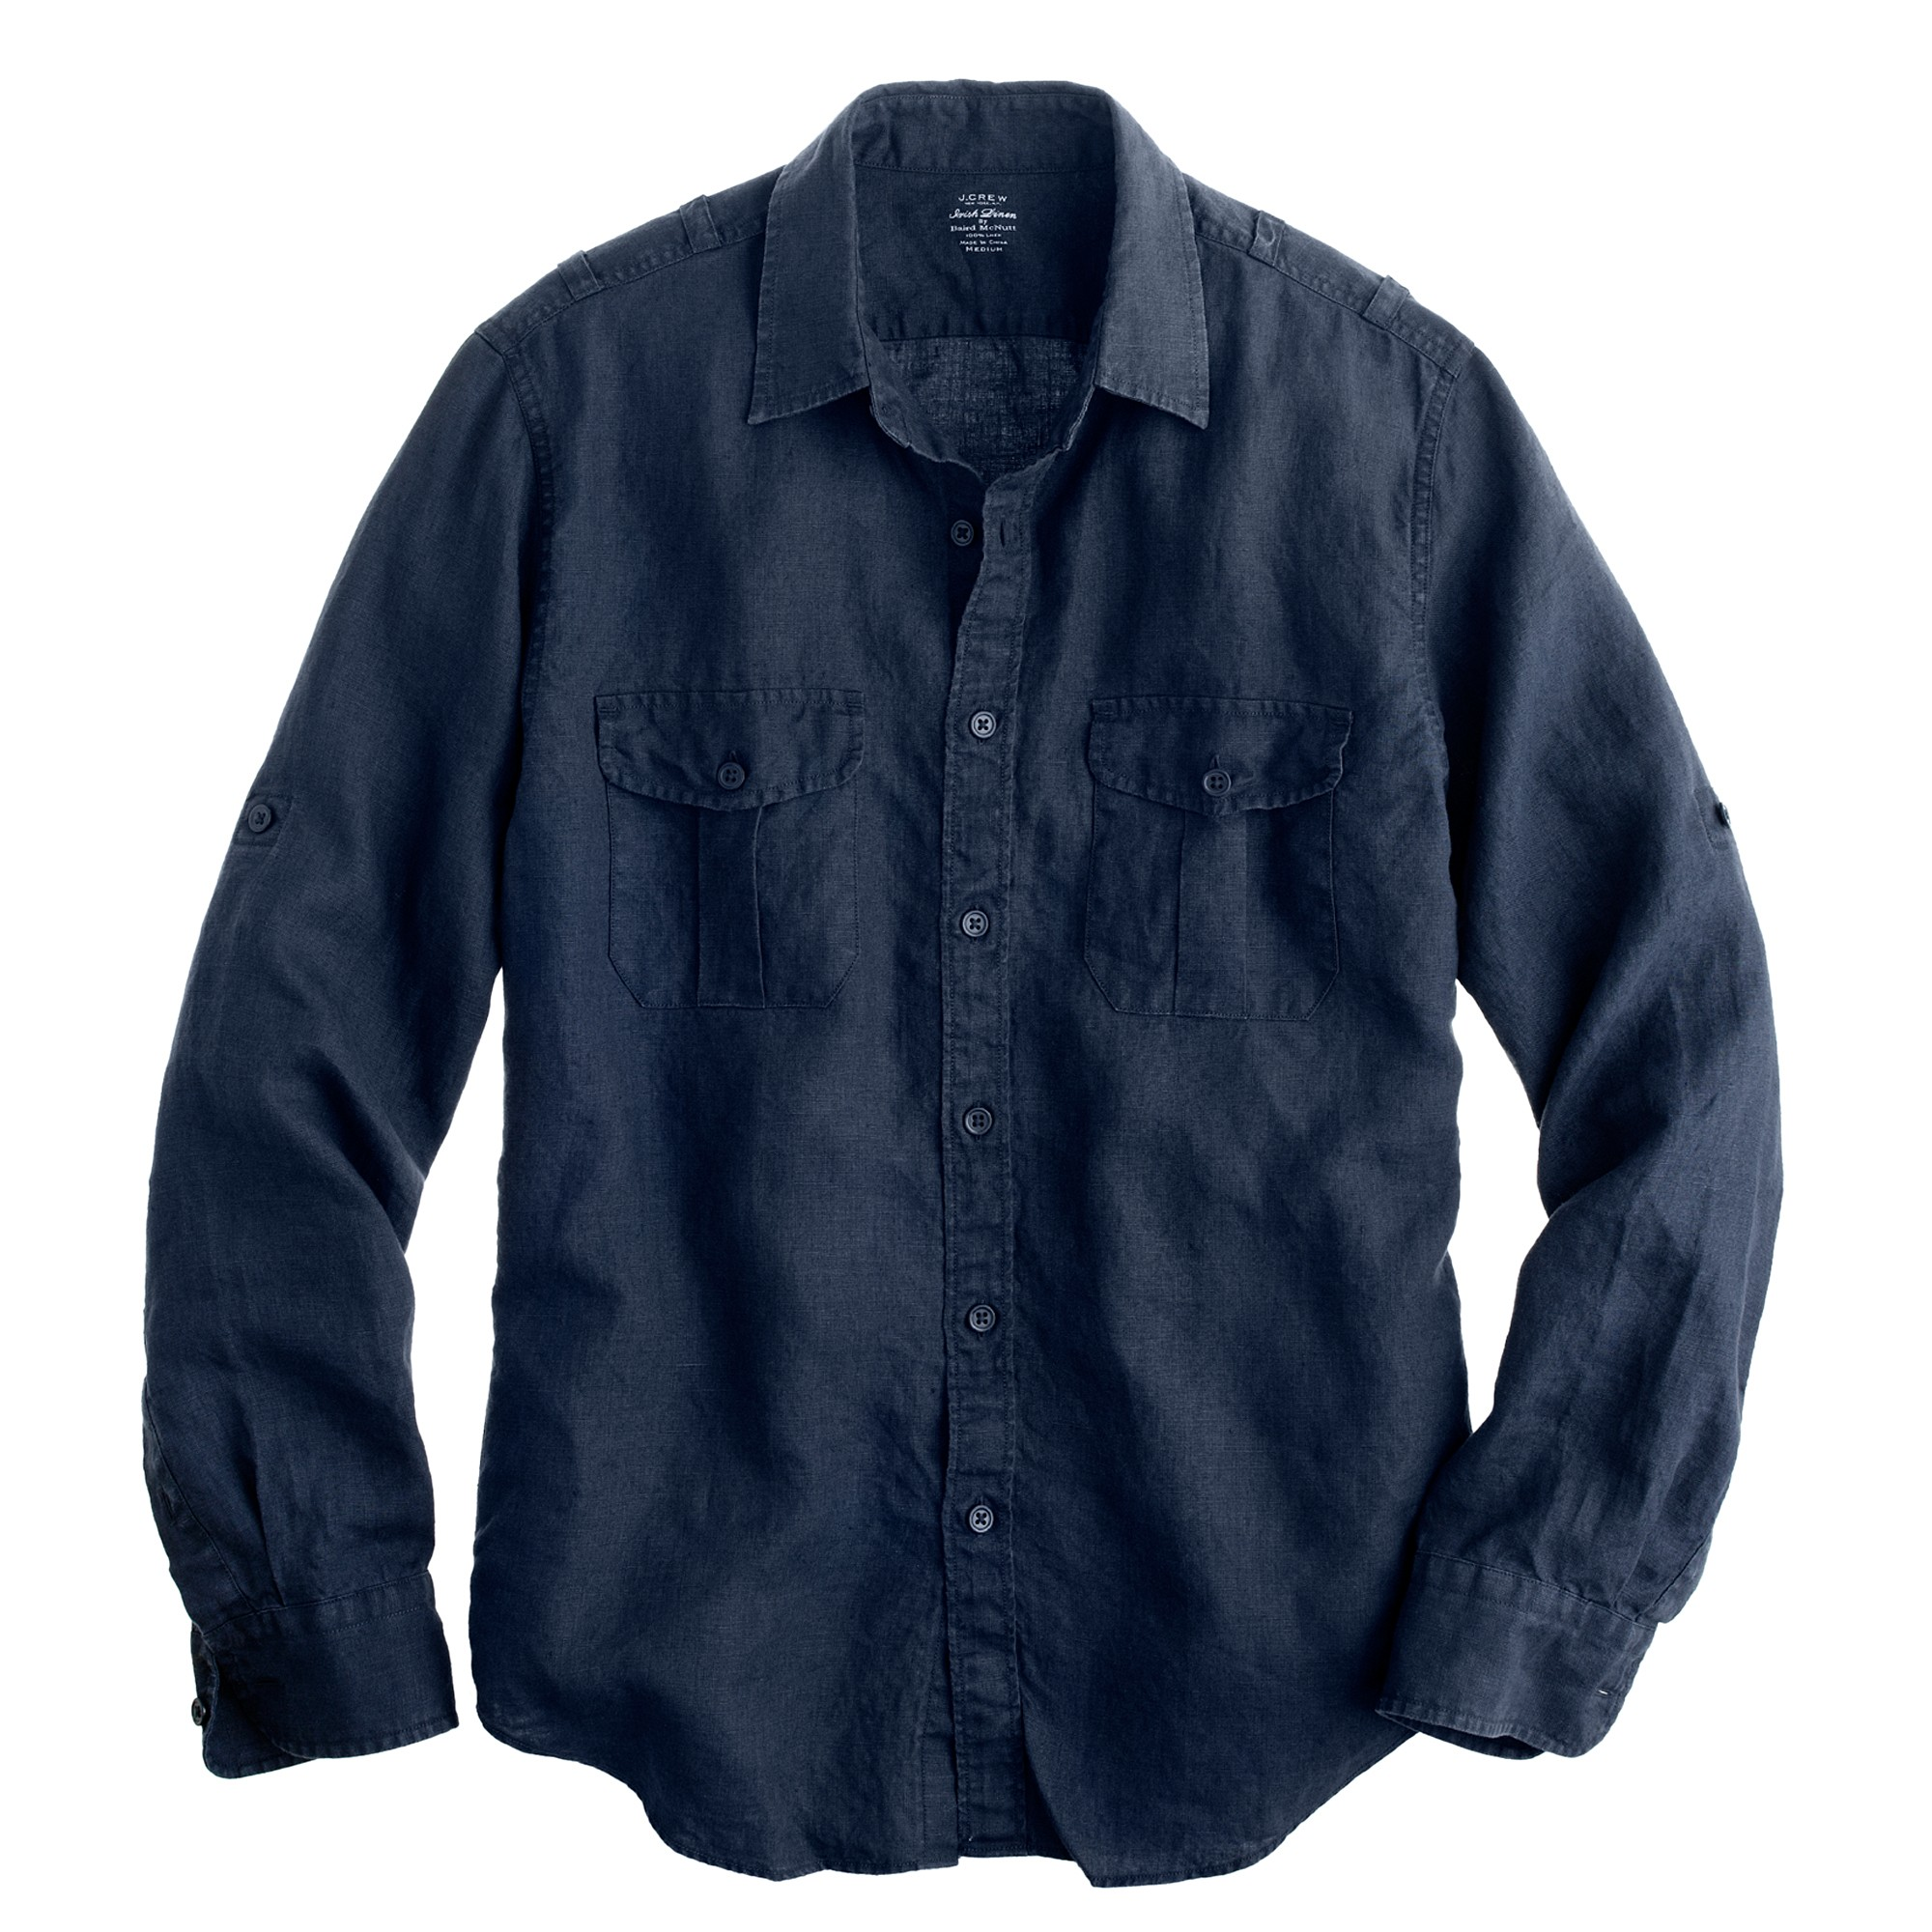 irish linen camp shirt in blue for men deep harbor